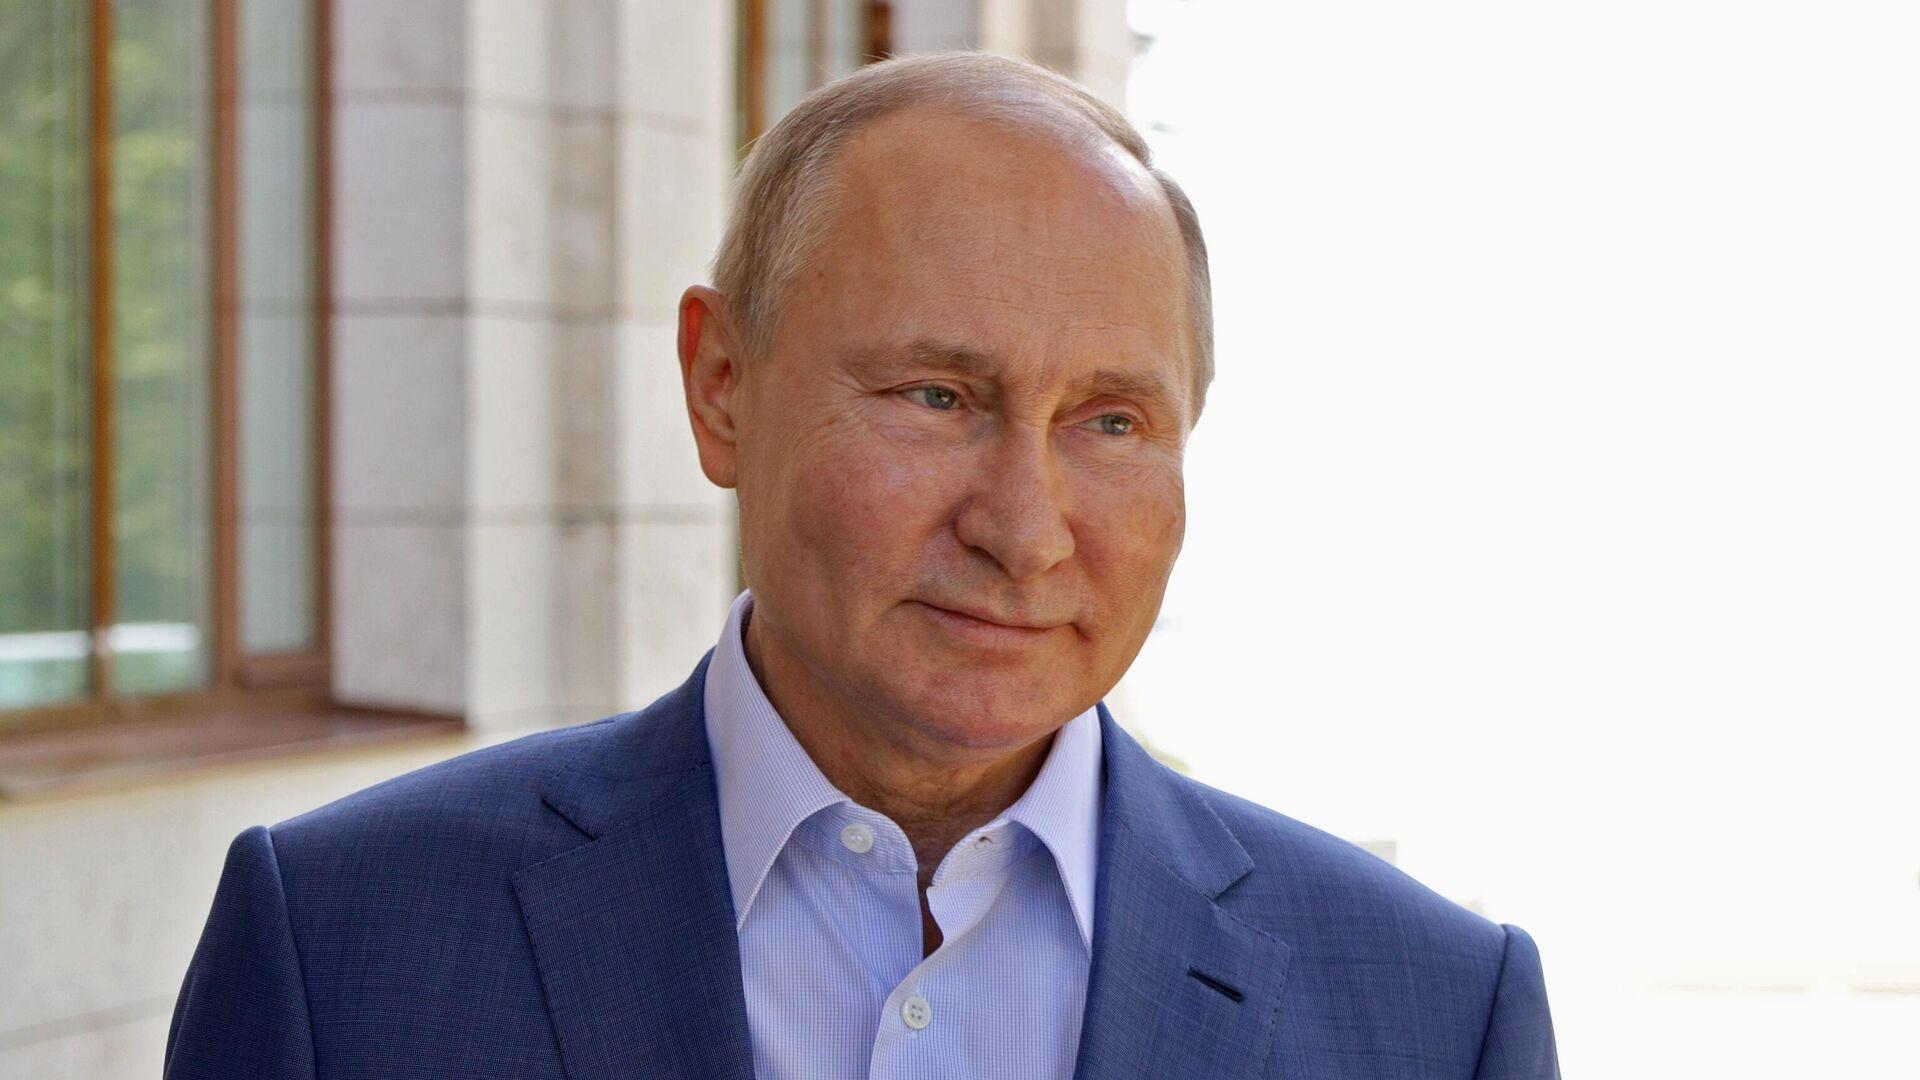 Президент РФ Владимир Путин в Сочи. 10 мая 2021 - РИА Новости, 1920, 13.05.2021